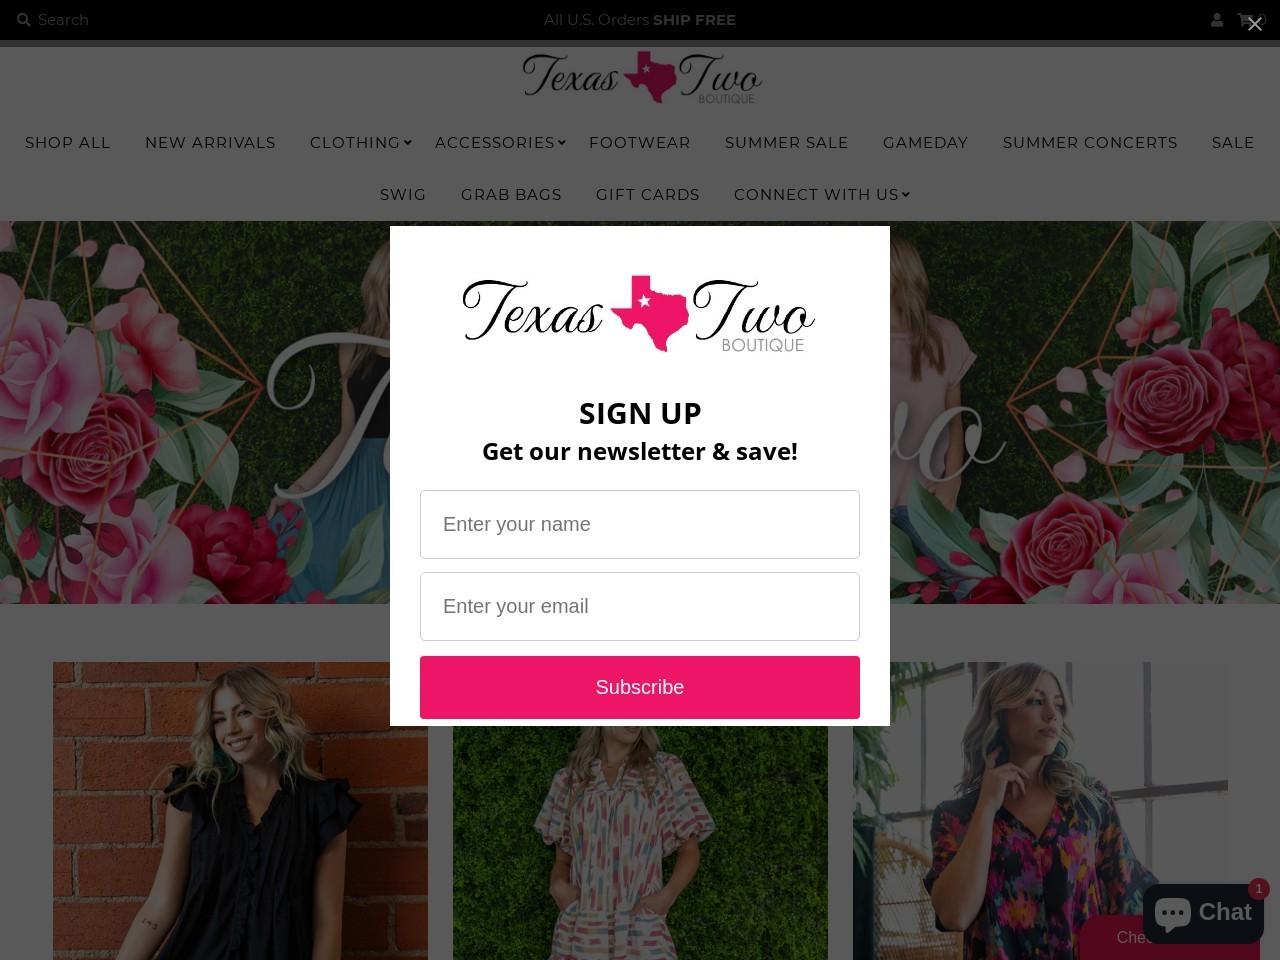 texastwoboutique.com